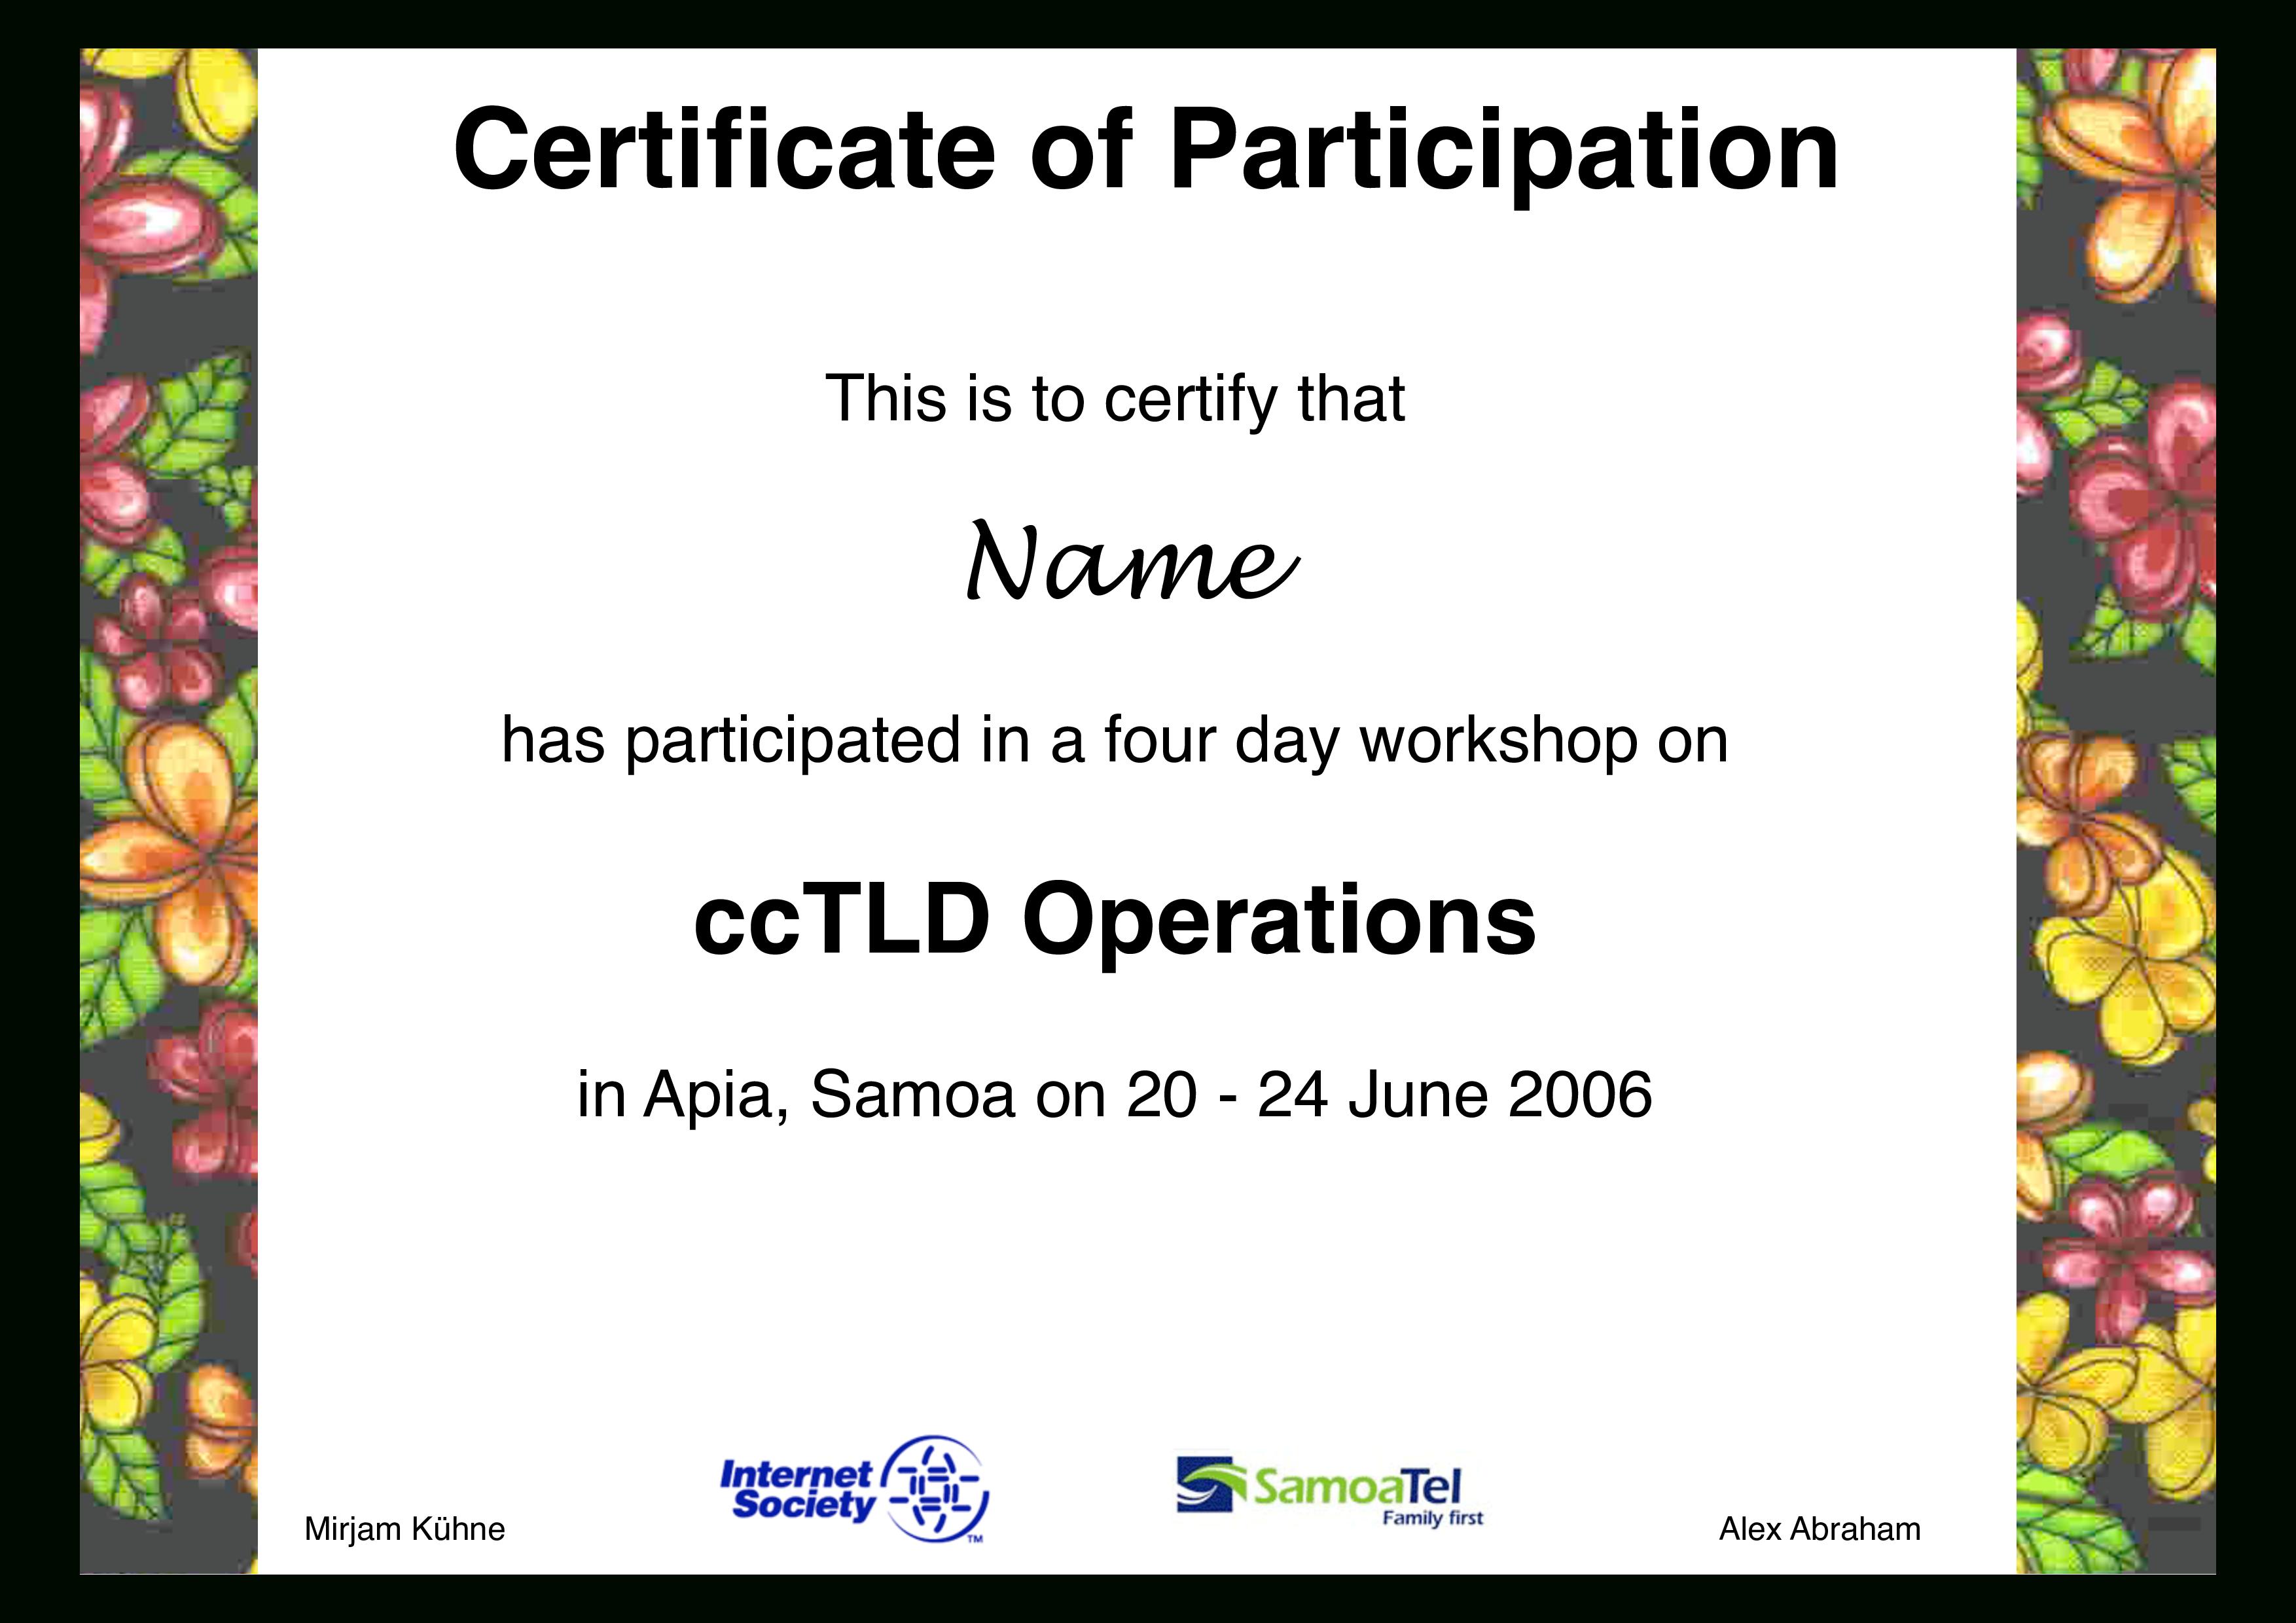 Workshop Participation Certificate   Templates At Throughout Certificate Of Participation In Workshop Template